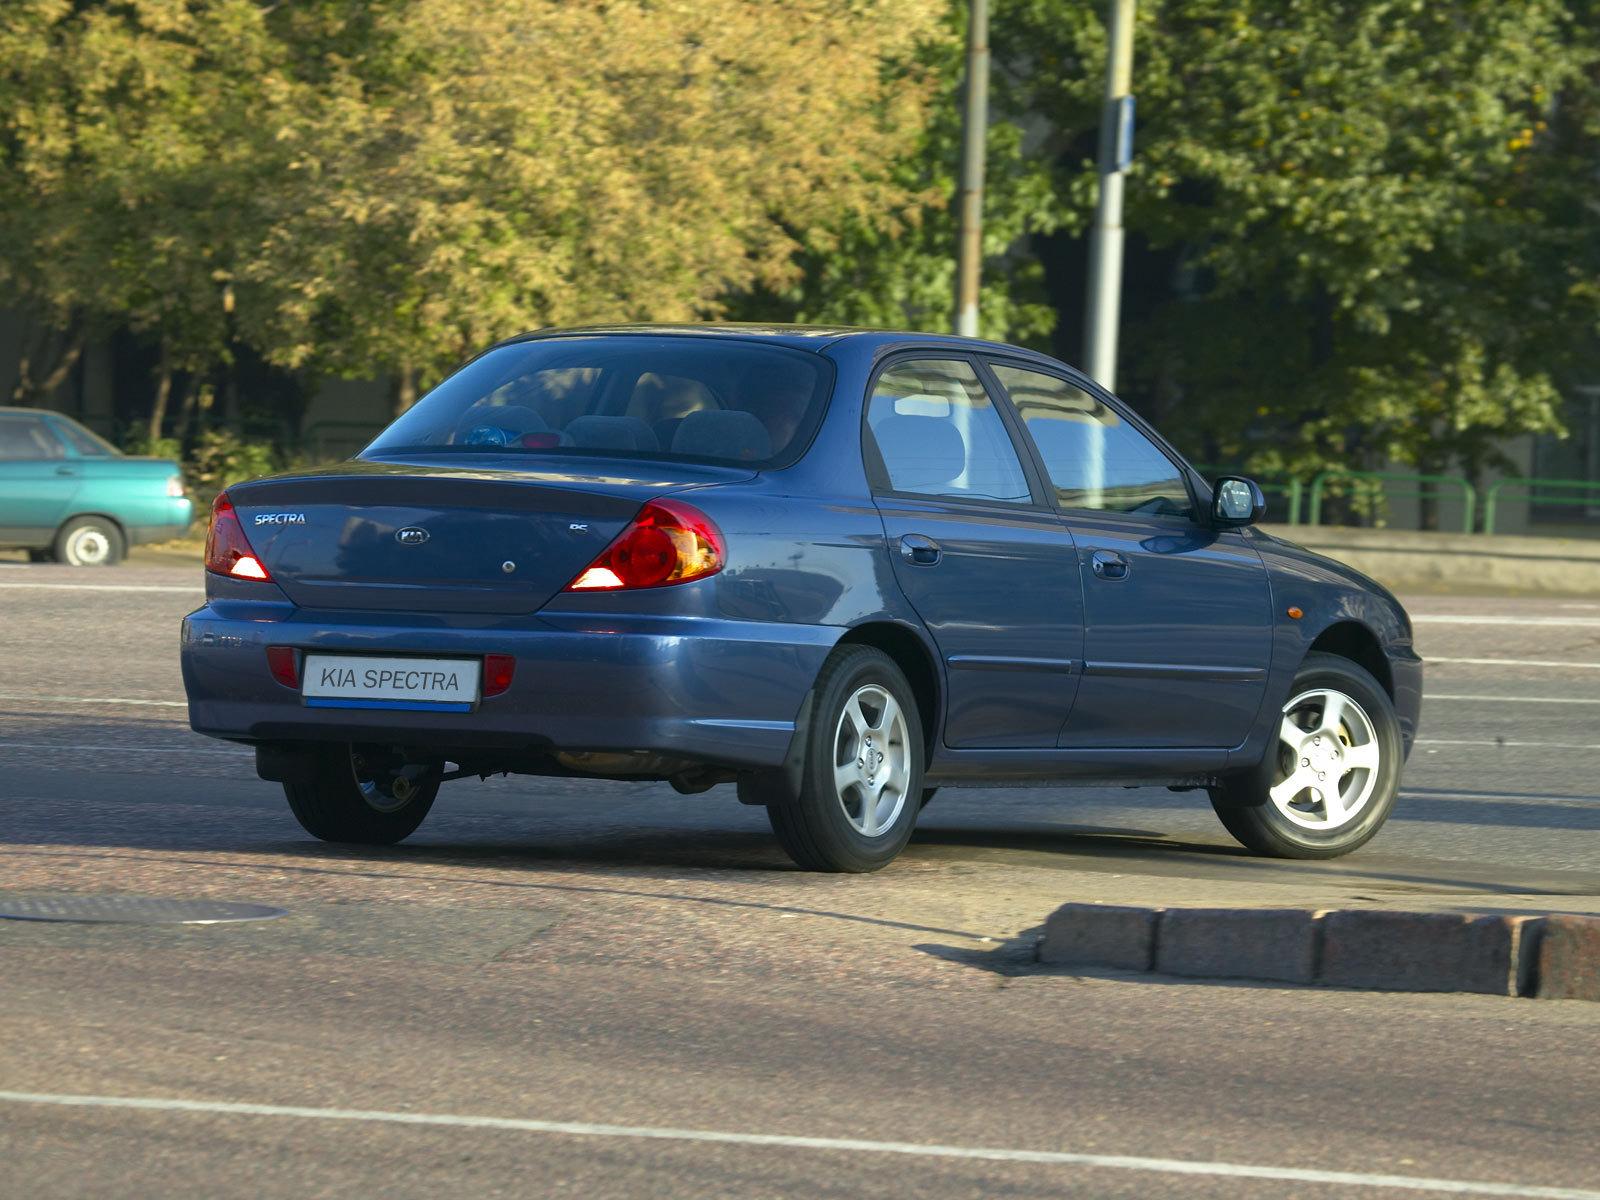 Характеристики автомобиля Kia Spectra Spectra, модификации 1.6 i 16V